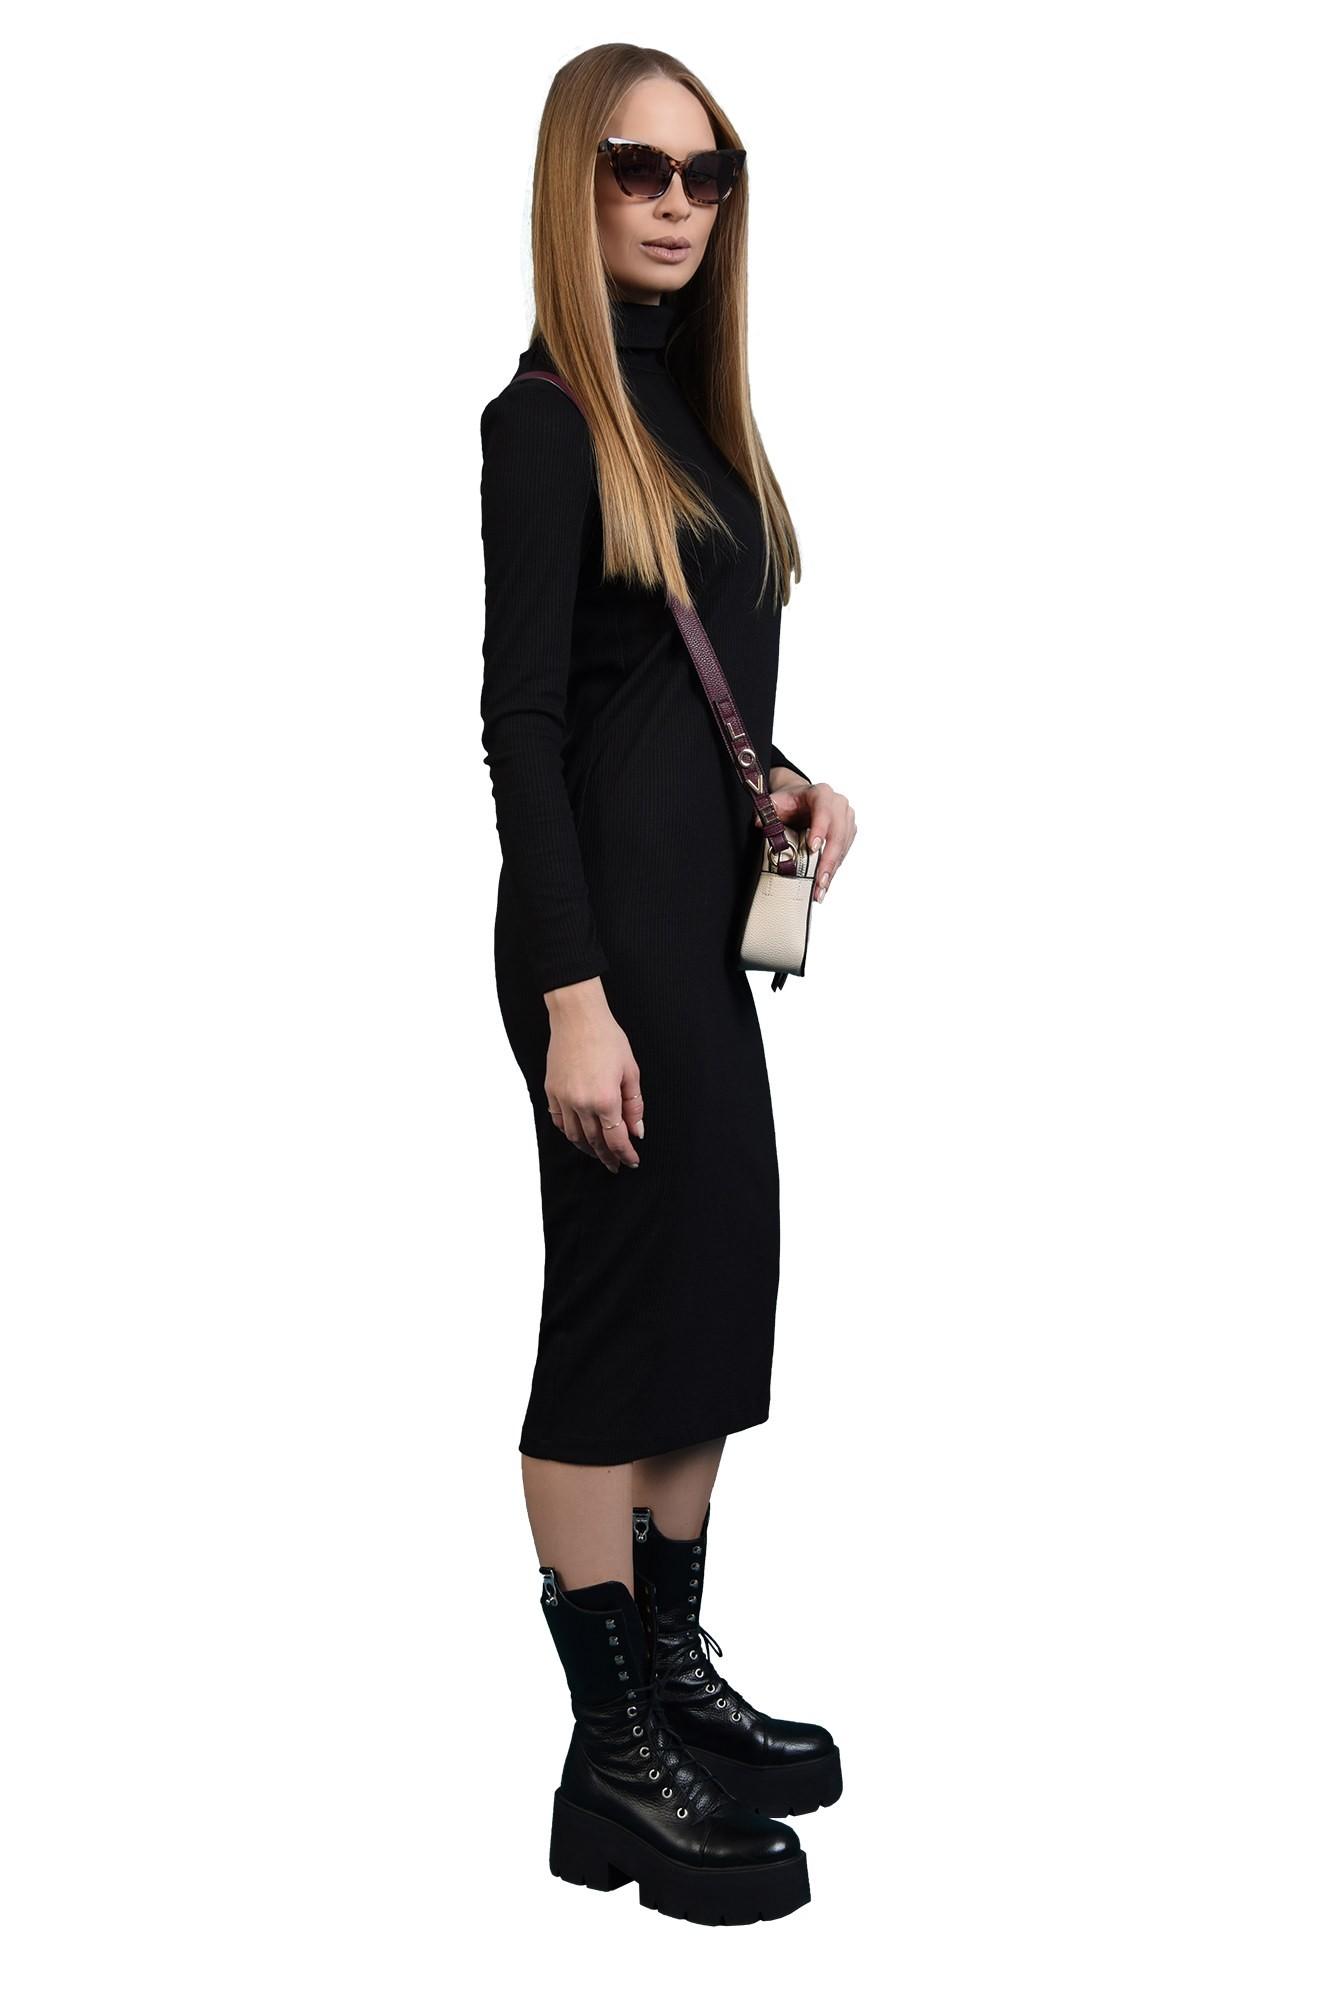 3 - rochie midi, neagra, tricotata, cu maneca lunga